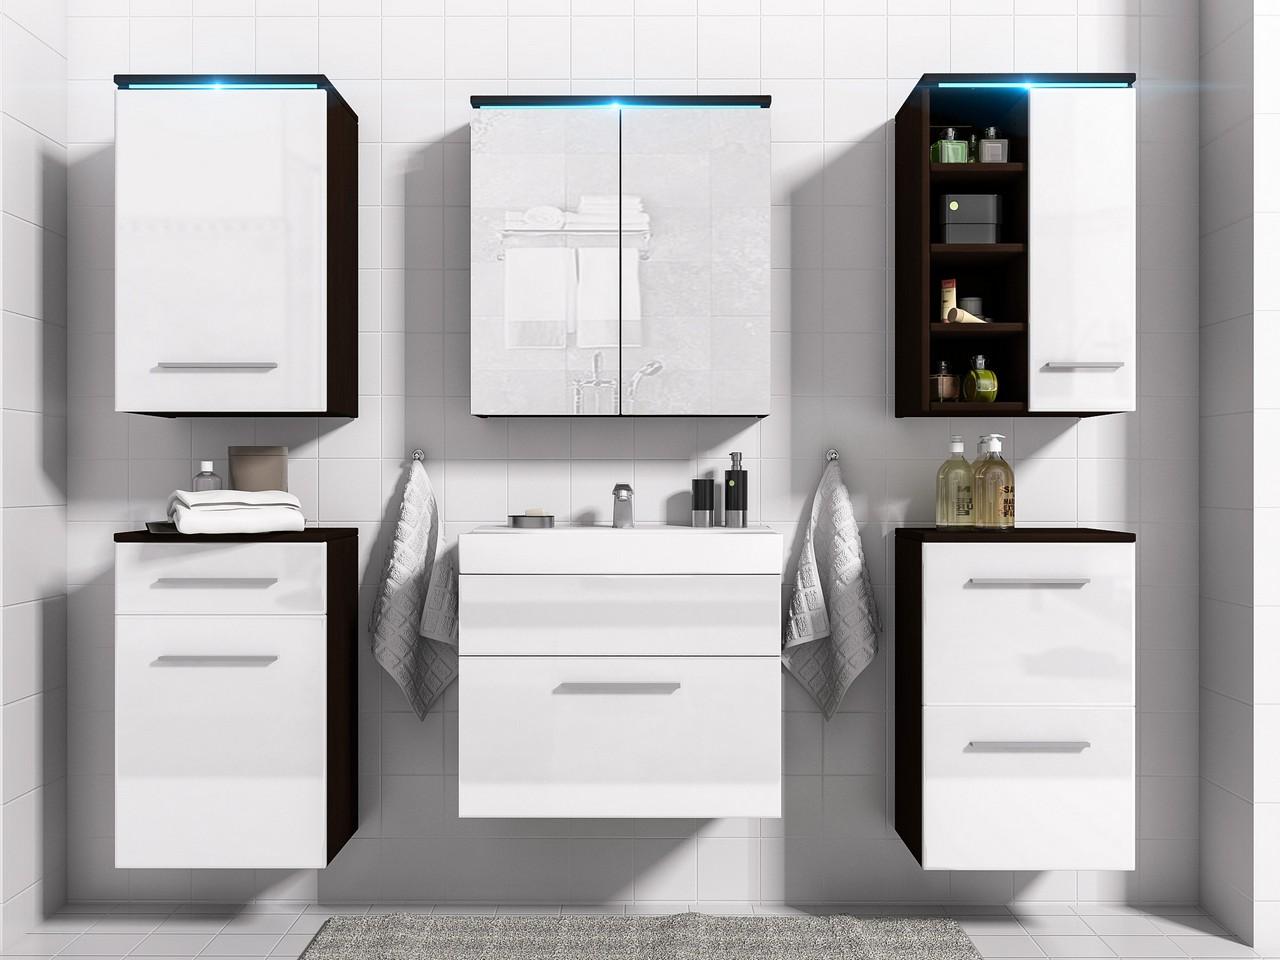 MEBLINE Koupelna MEGI wenge / bílý lesk